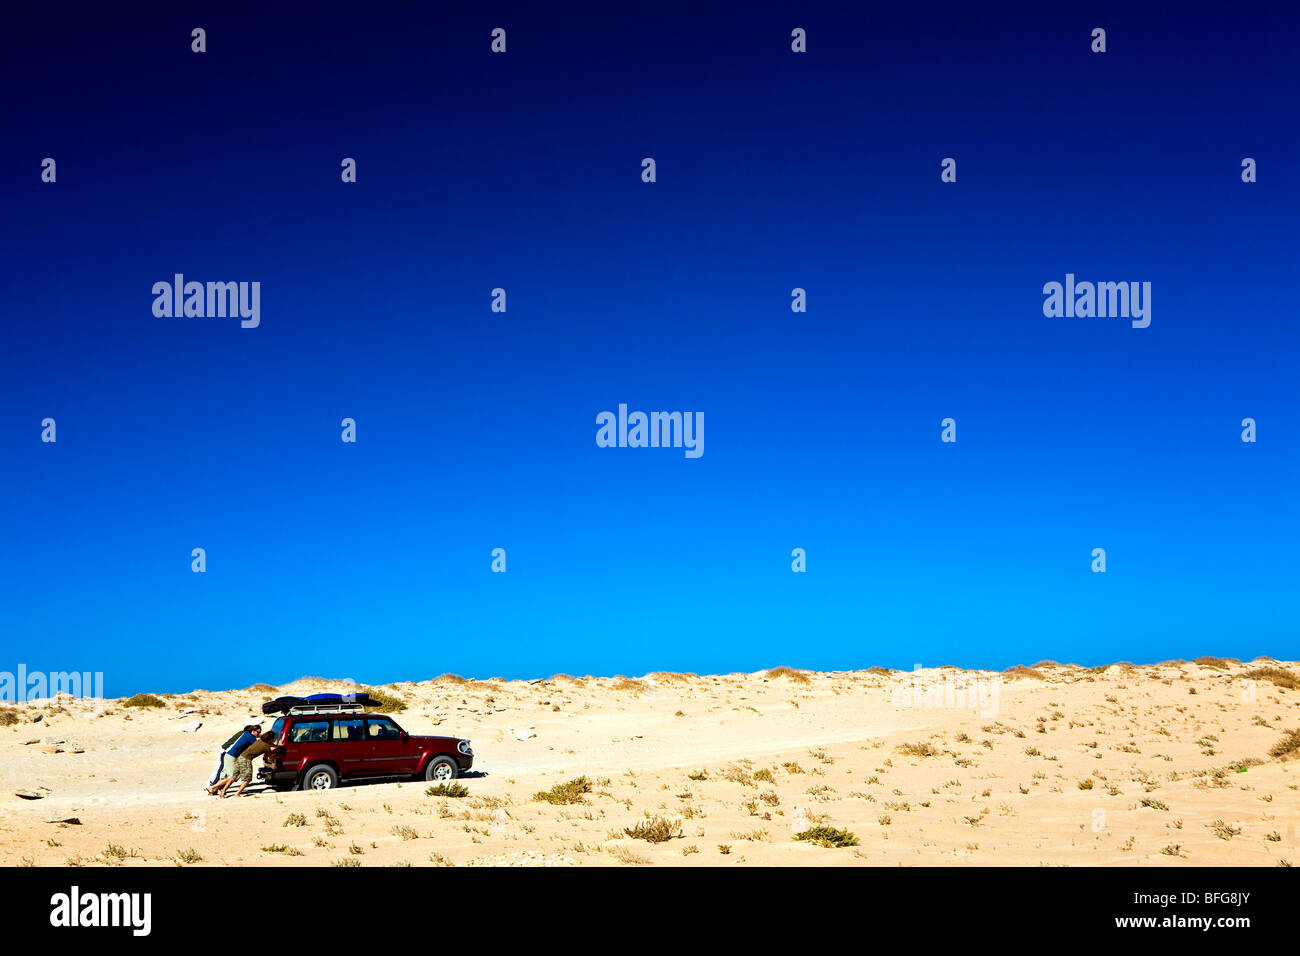 Mauritania, Ras Nouadhibou Peninsula, Sahara Desert. - Stock Image